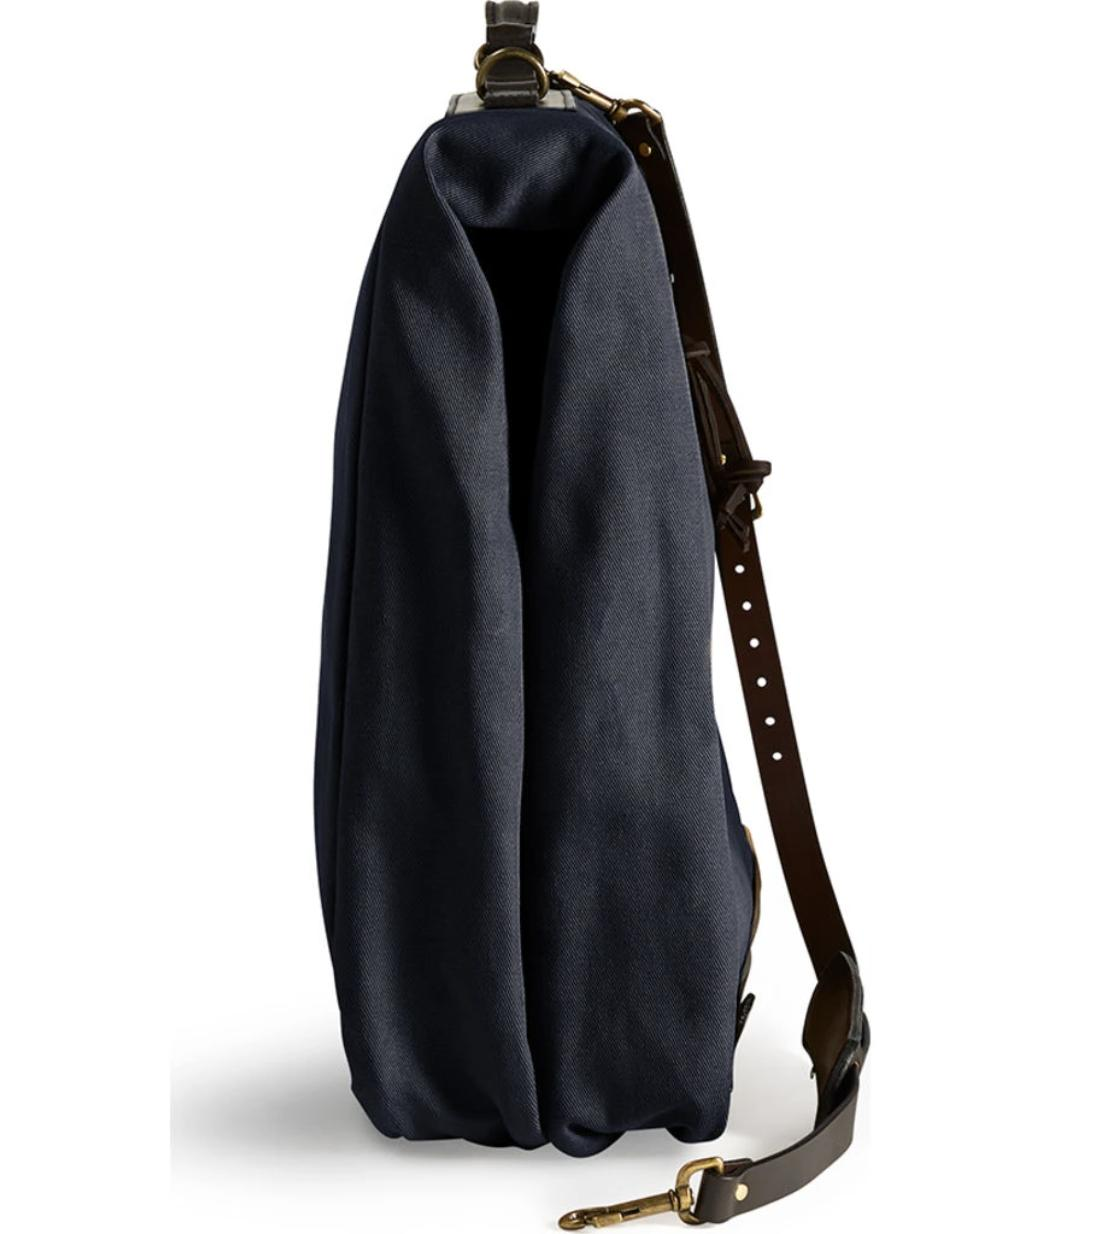 NWT Filson Rugged Bridle Leather Bag